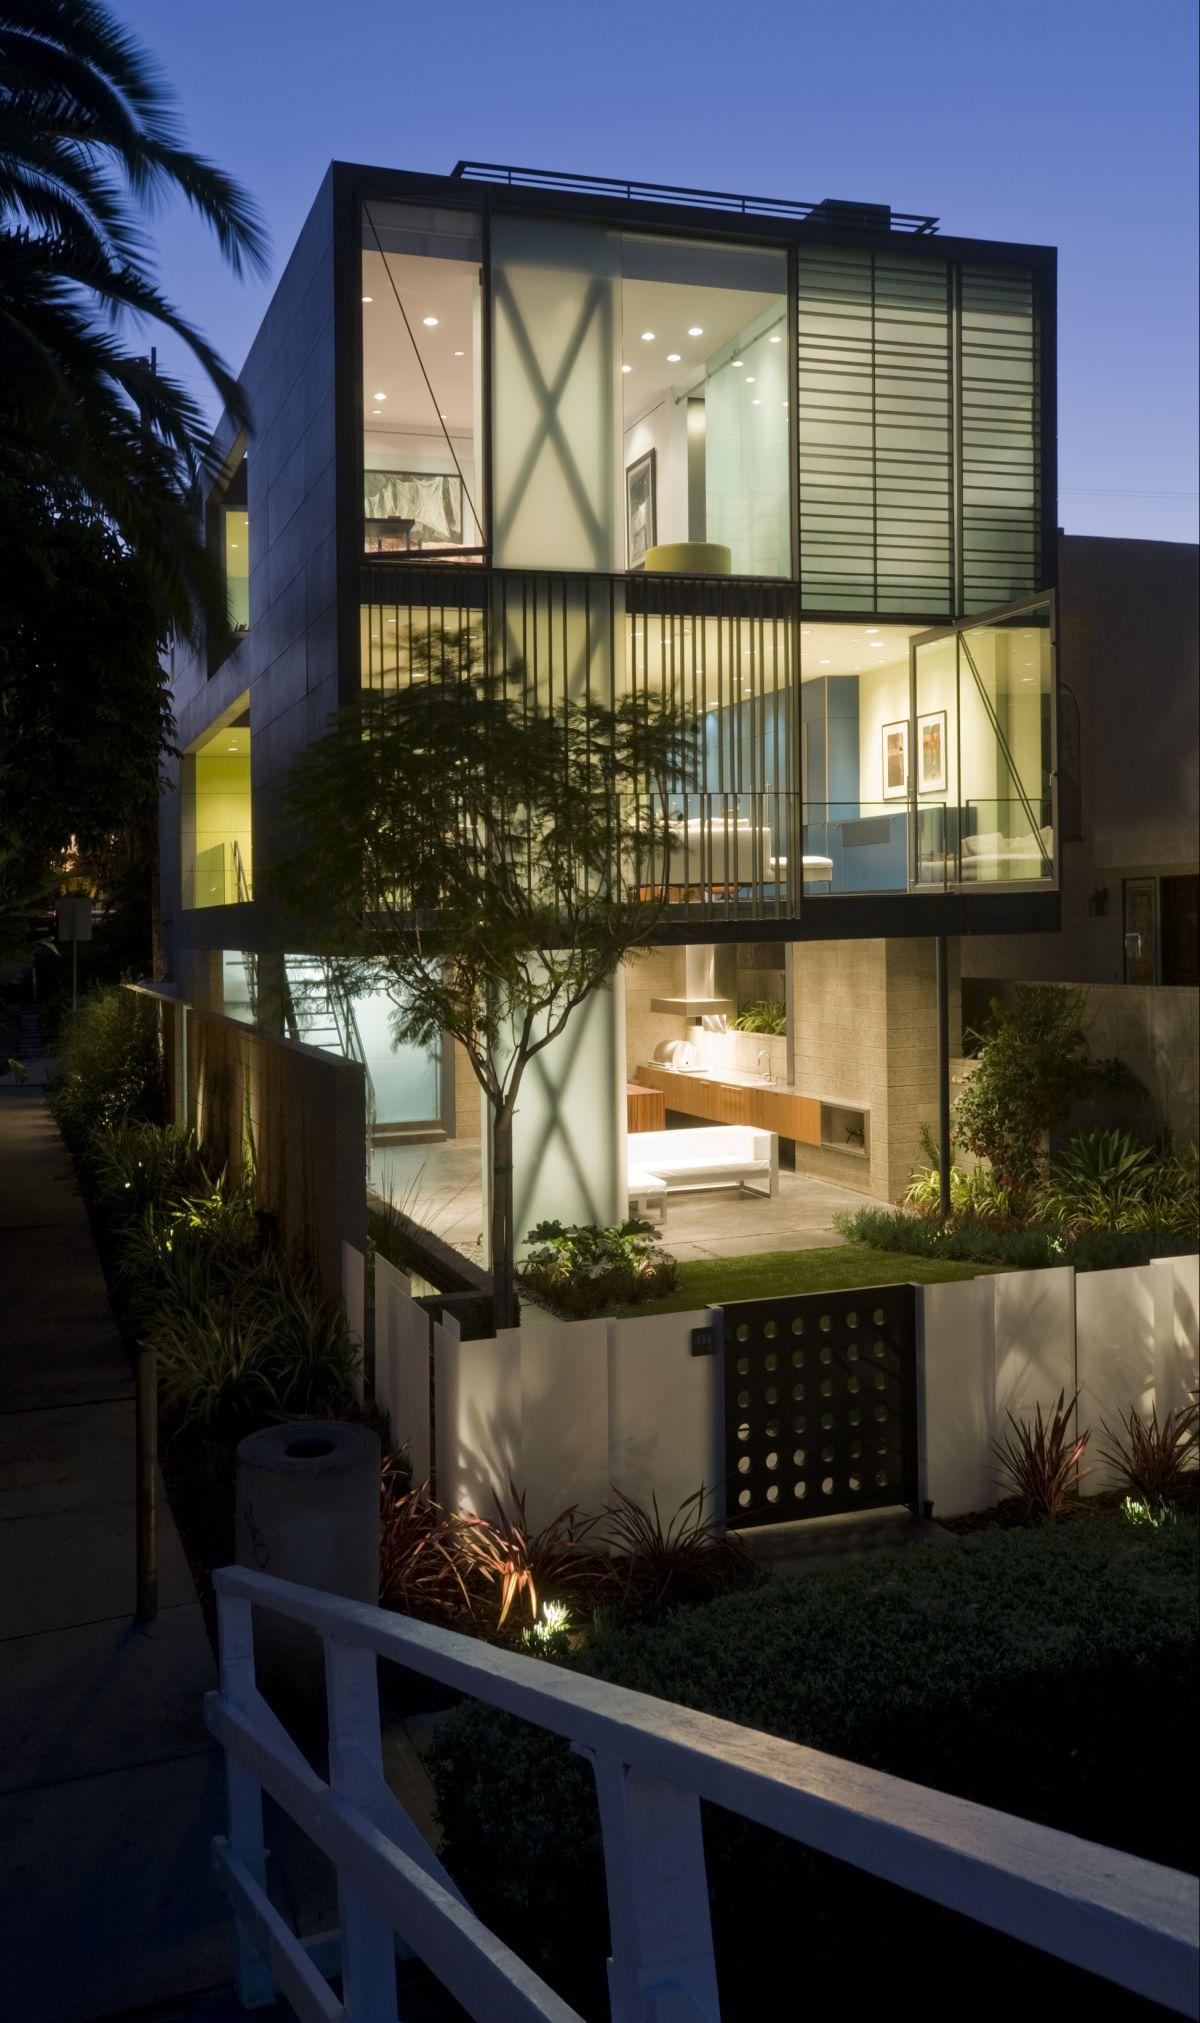 Bridge, View, Hover House 3, Los Angeles, California